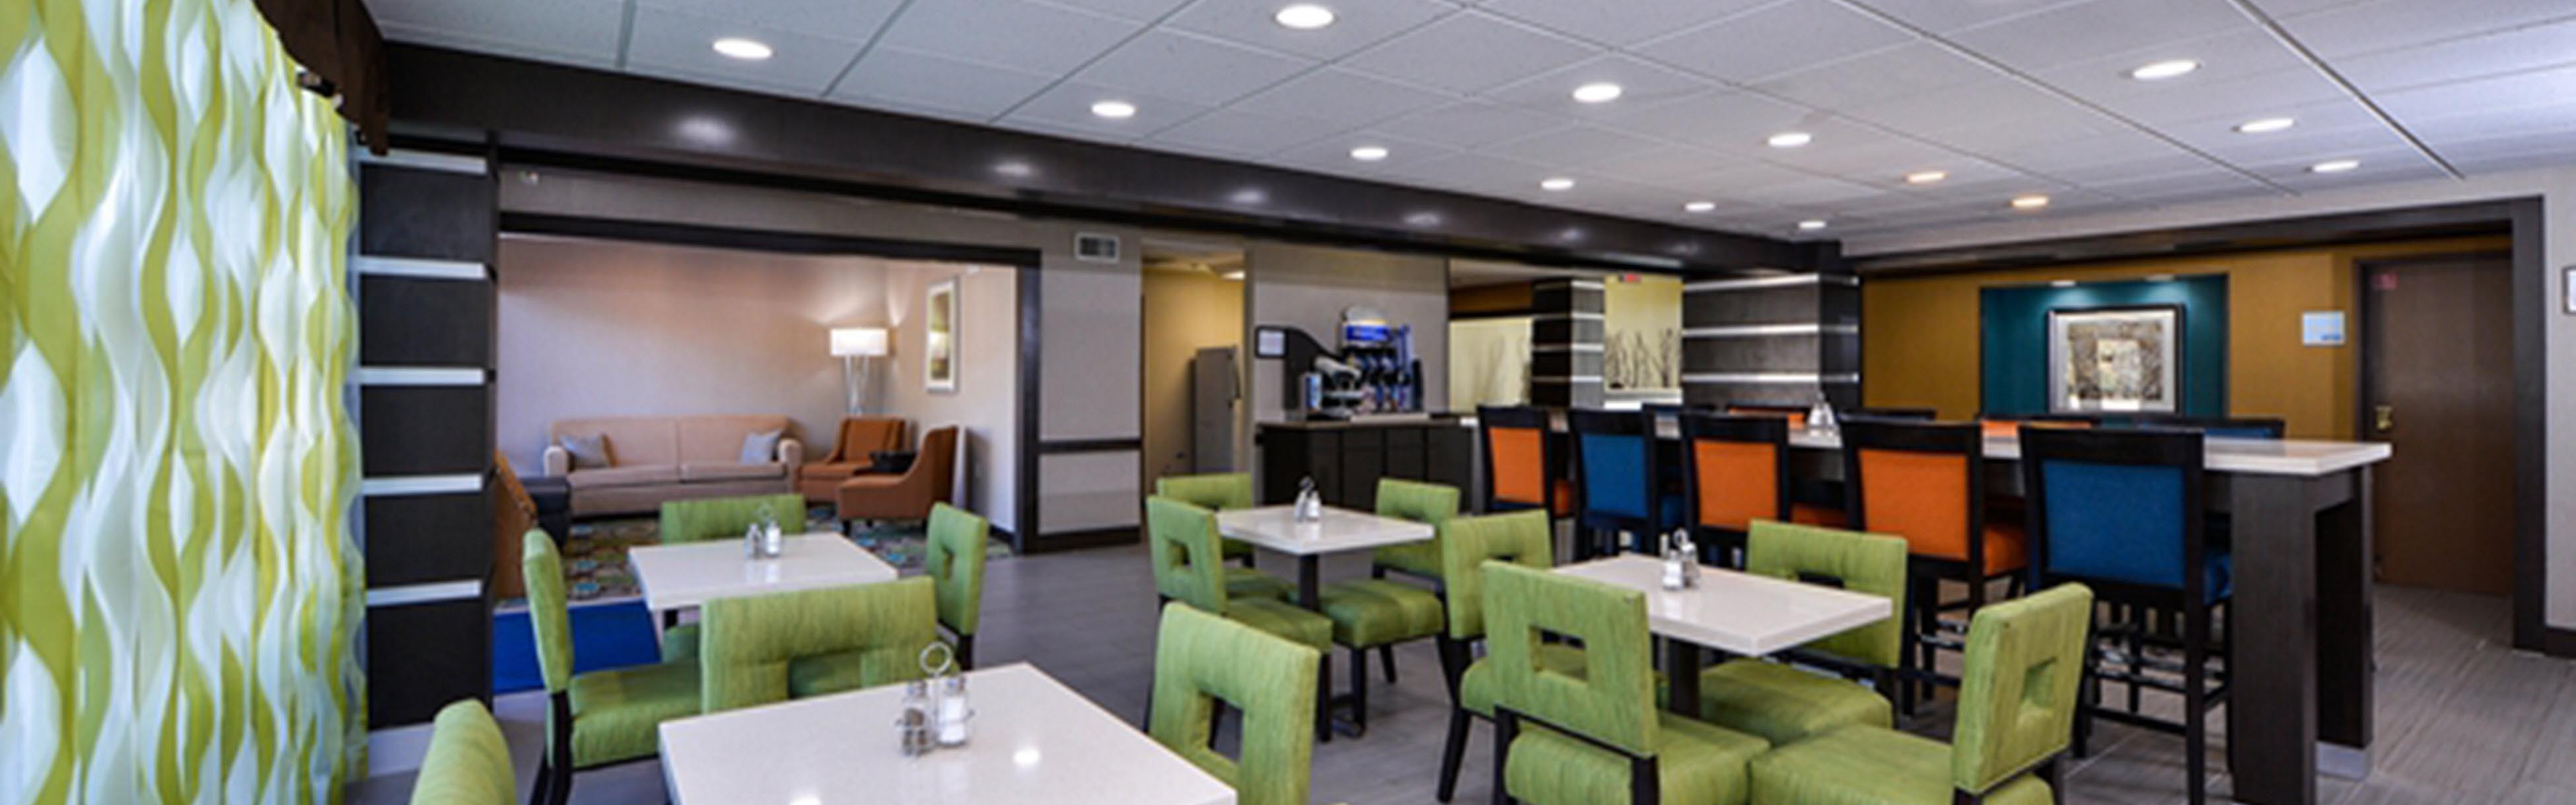 Holiday Inn Express & Suites Kingwood - Medical Center Area image 3